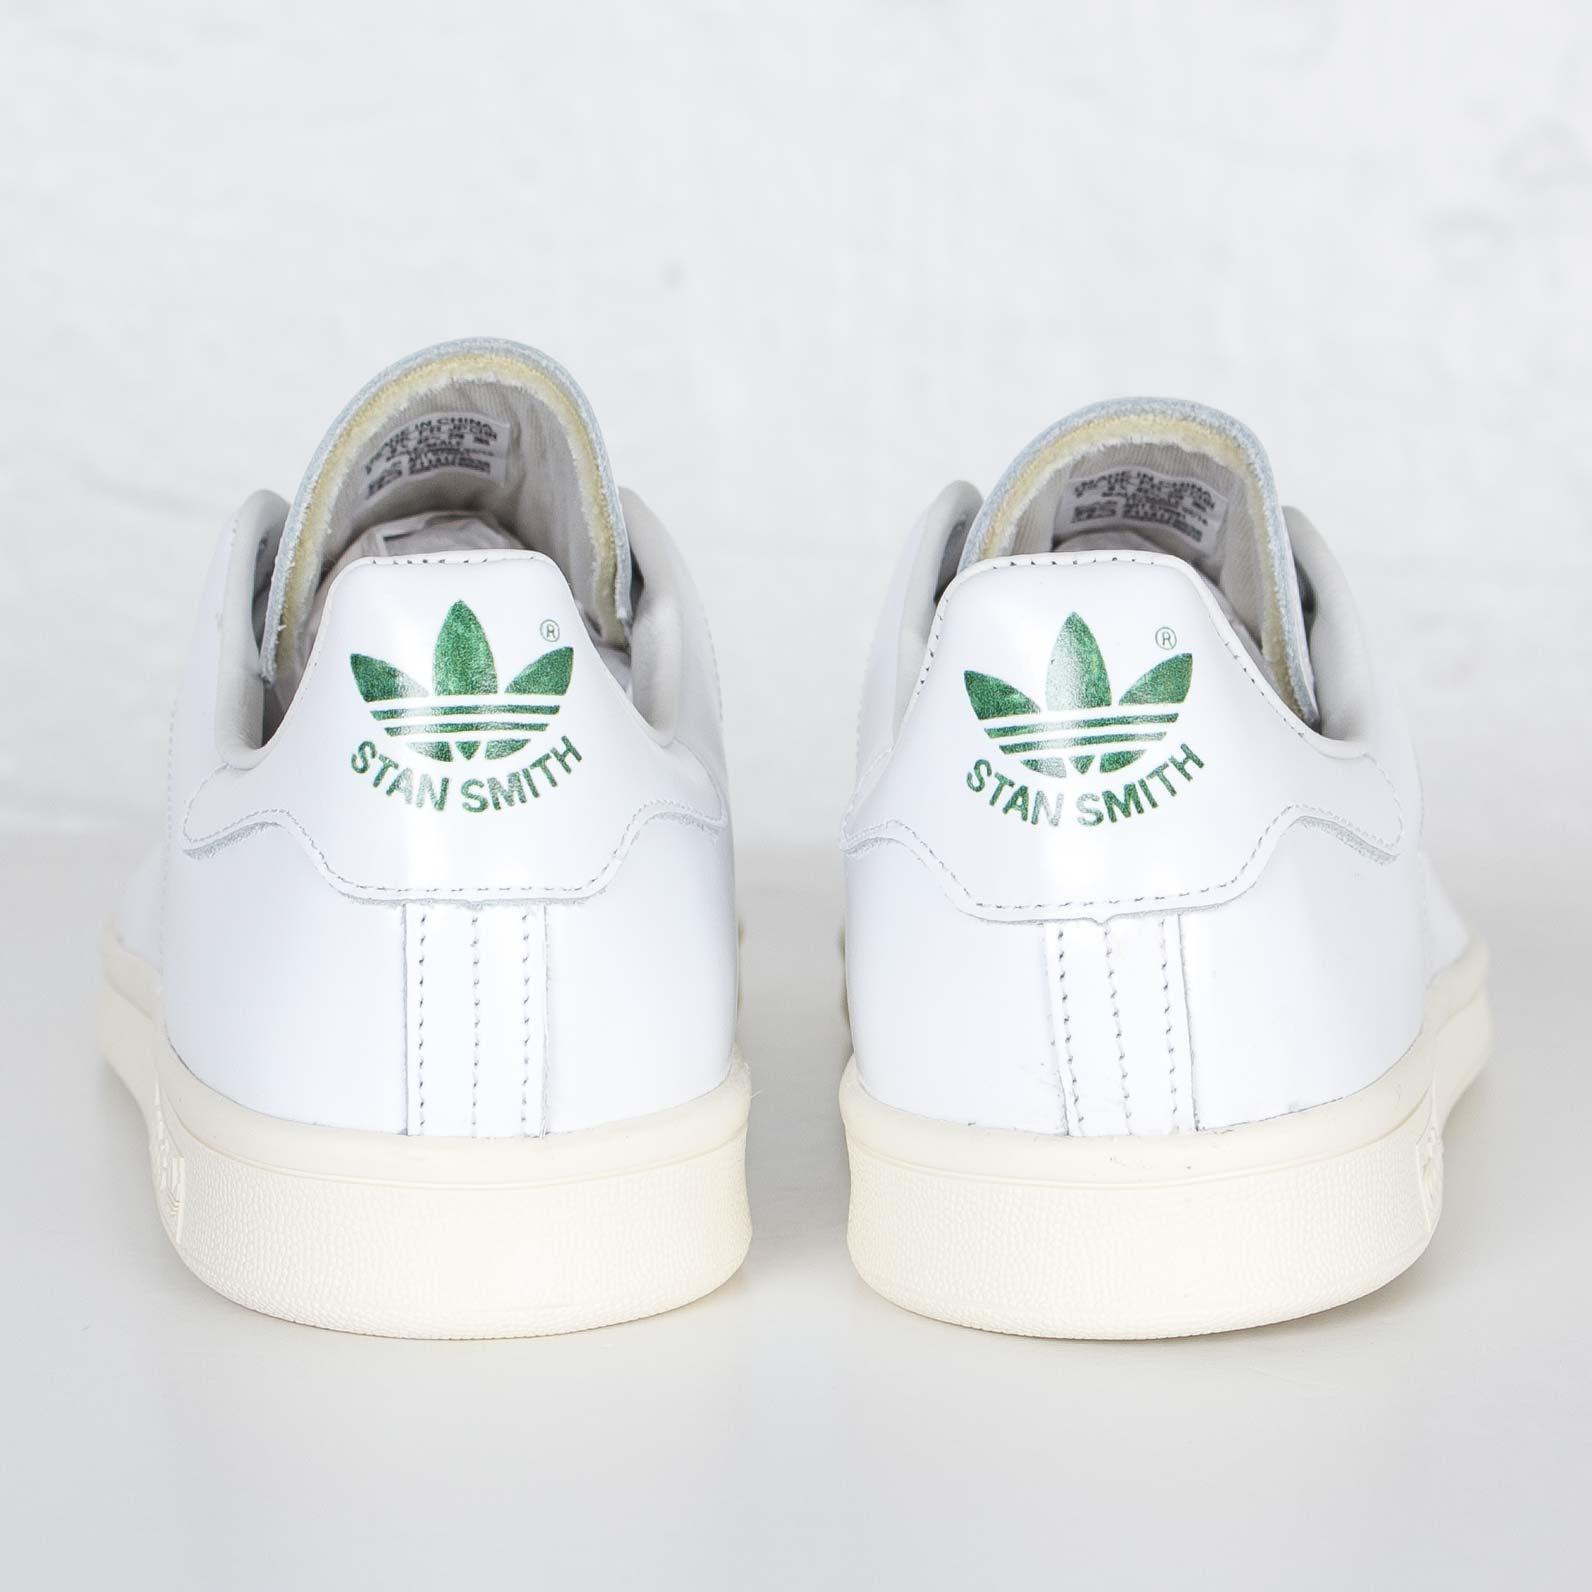 timeless design d91b1 6e536 adidas Stan Smith Nigo - S79591 - Sneakersnstuff | sneakers ...